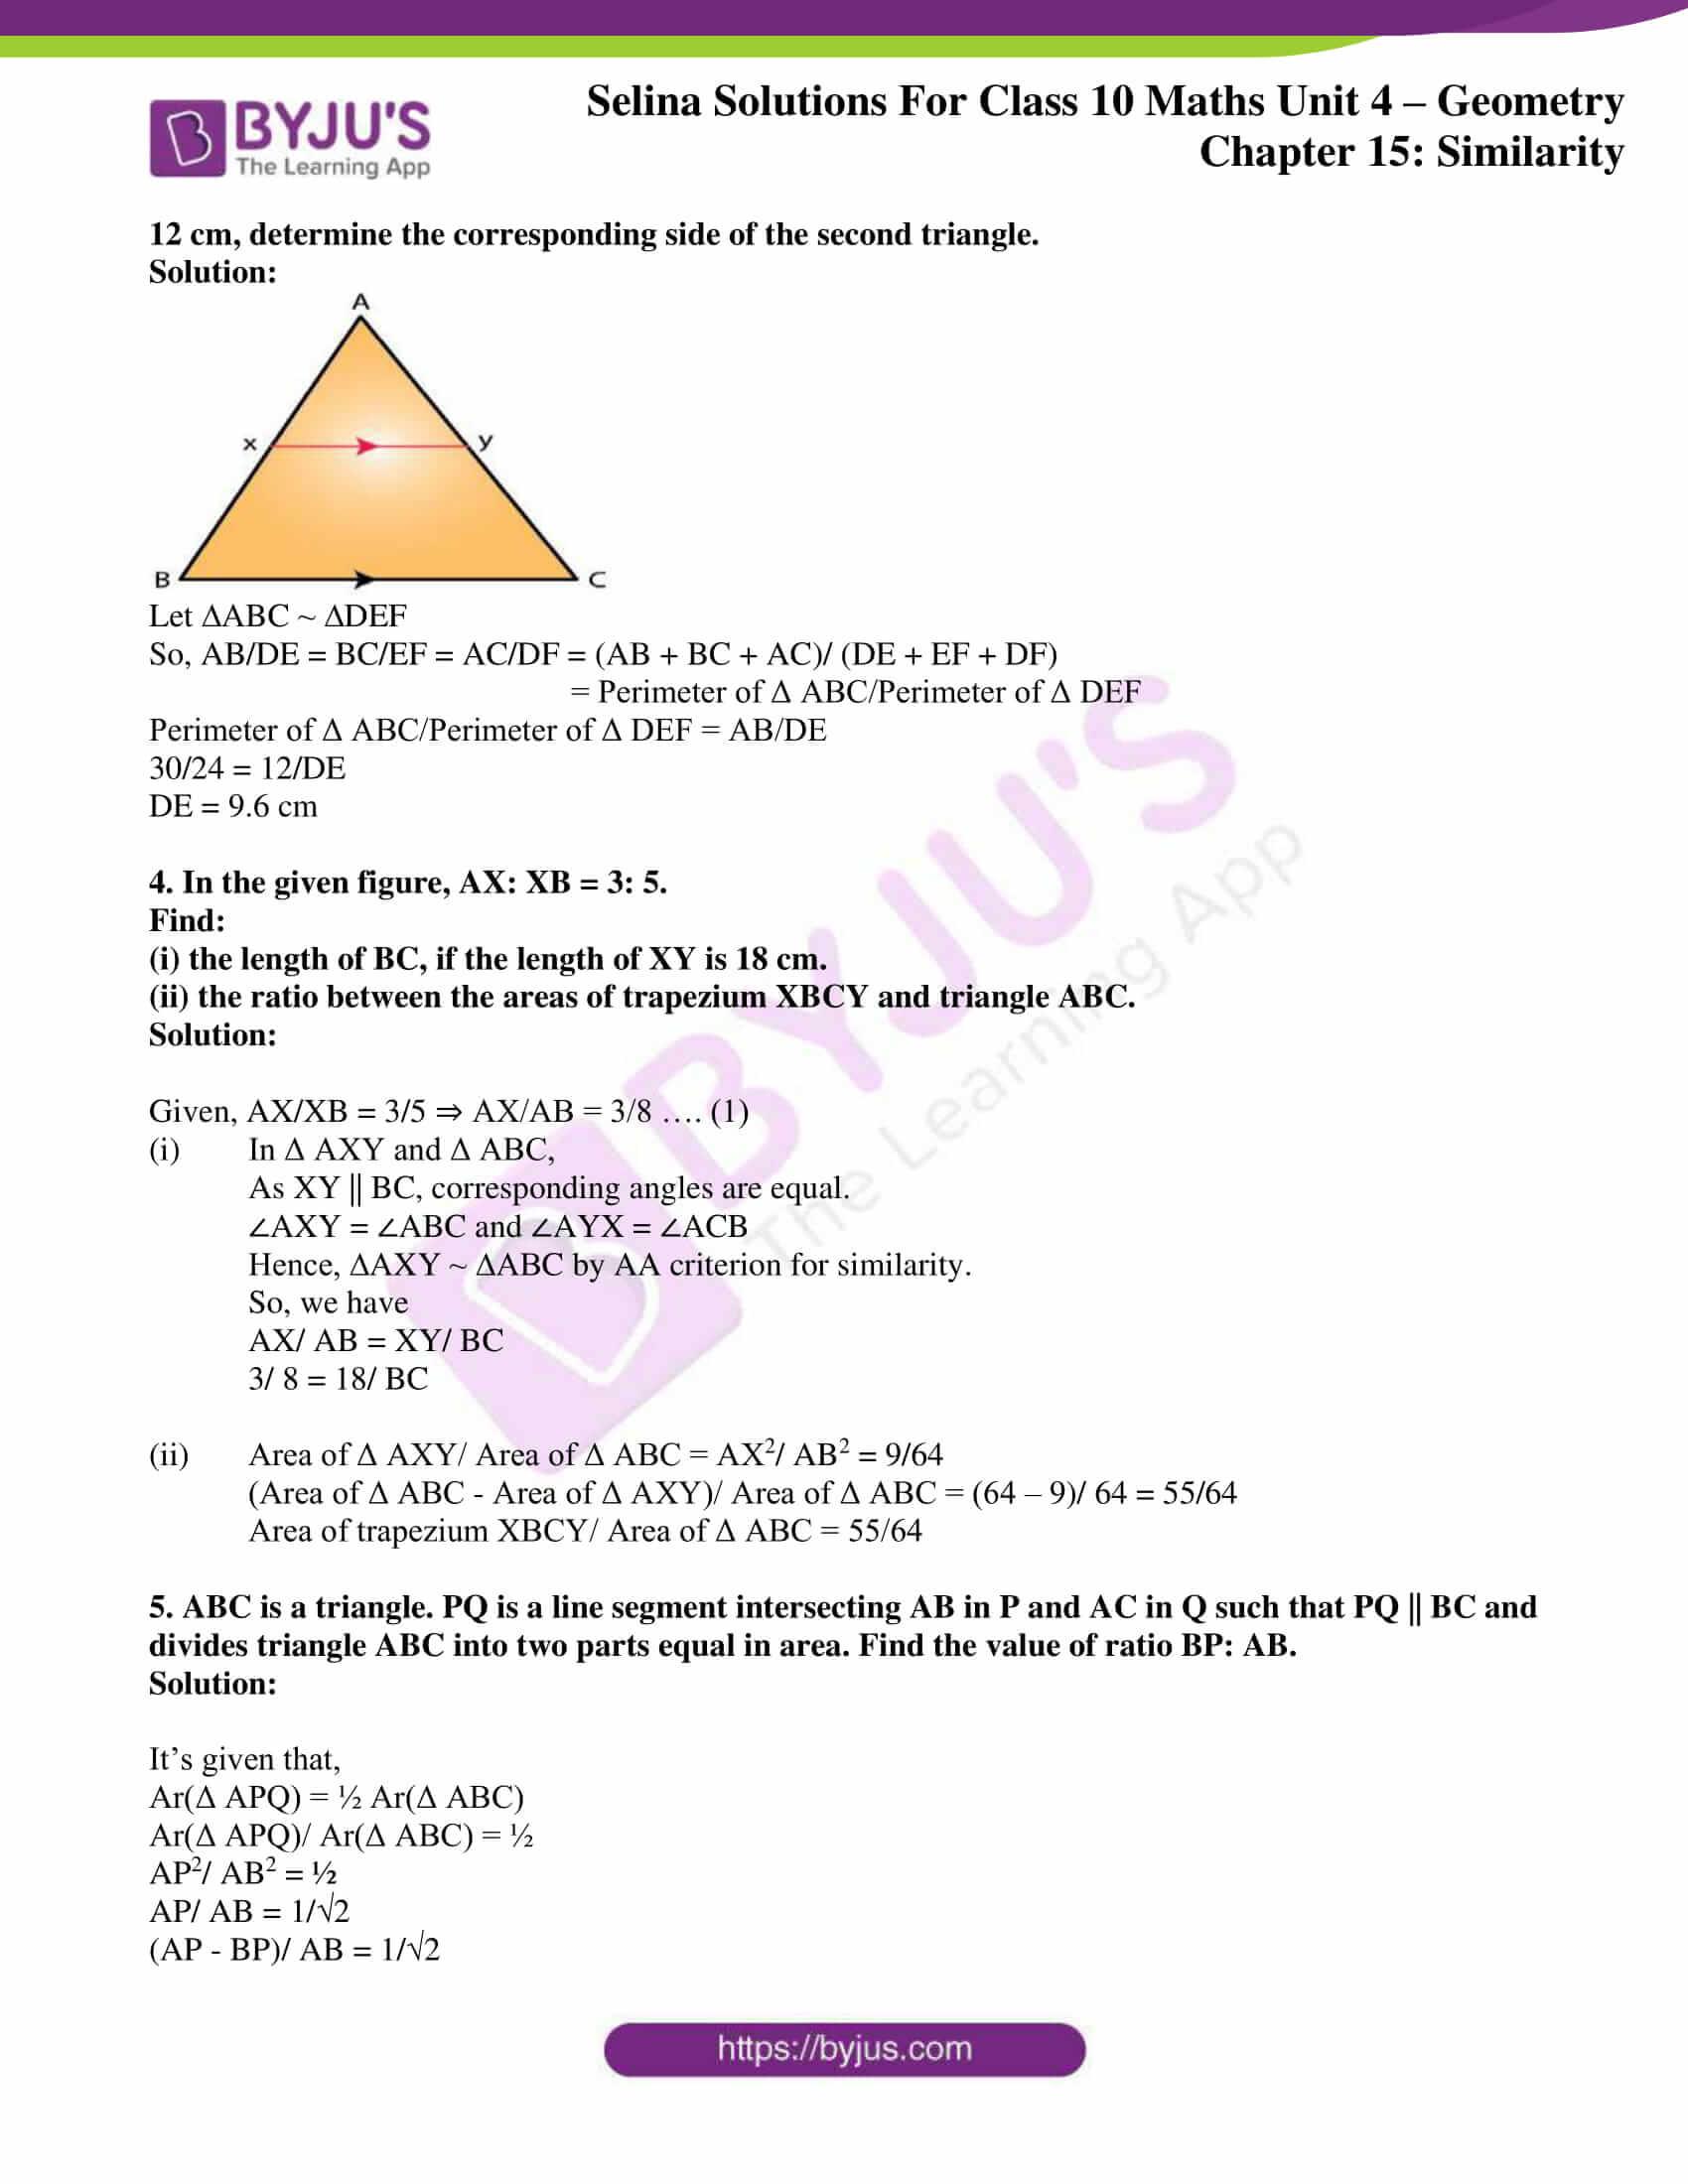 selina-sol-maths-class-10-ch-15-ex-c-2